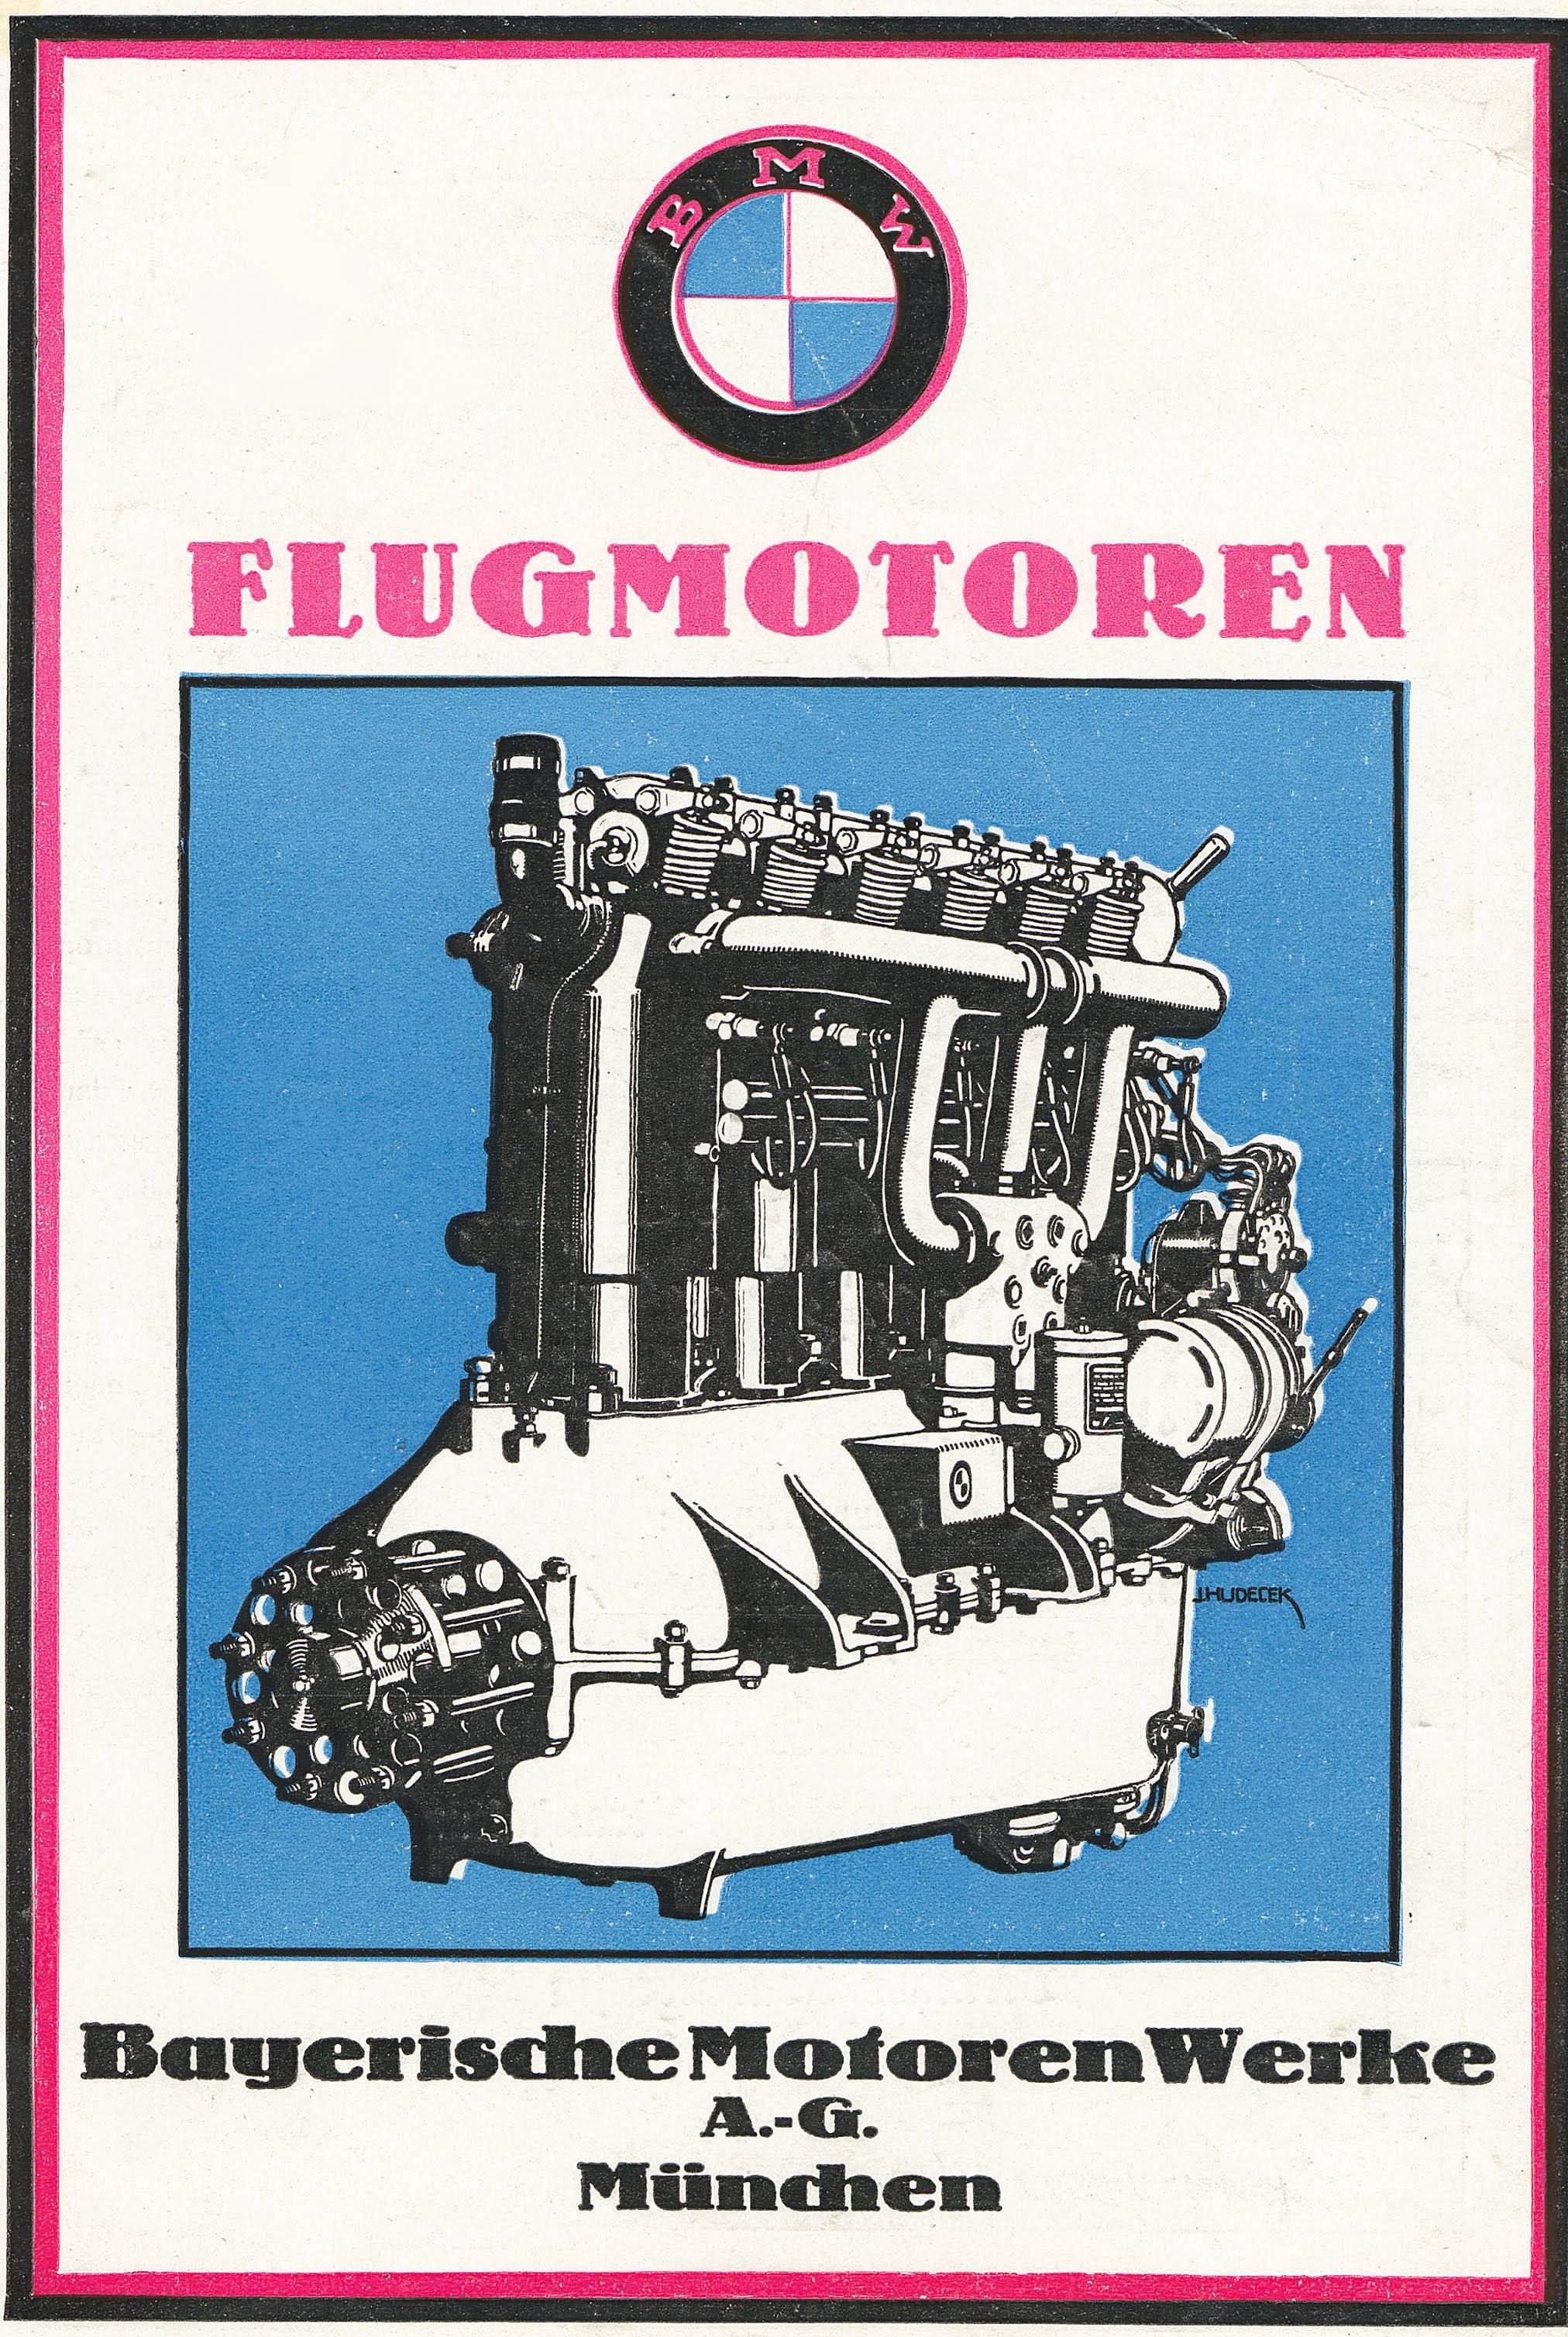 BMW Flugmotoren